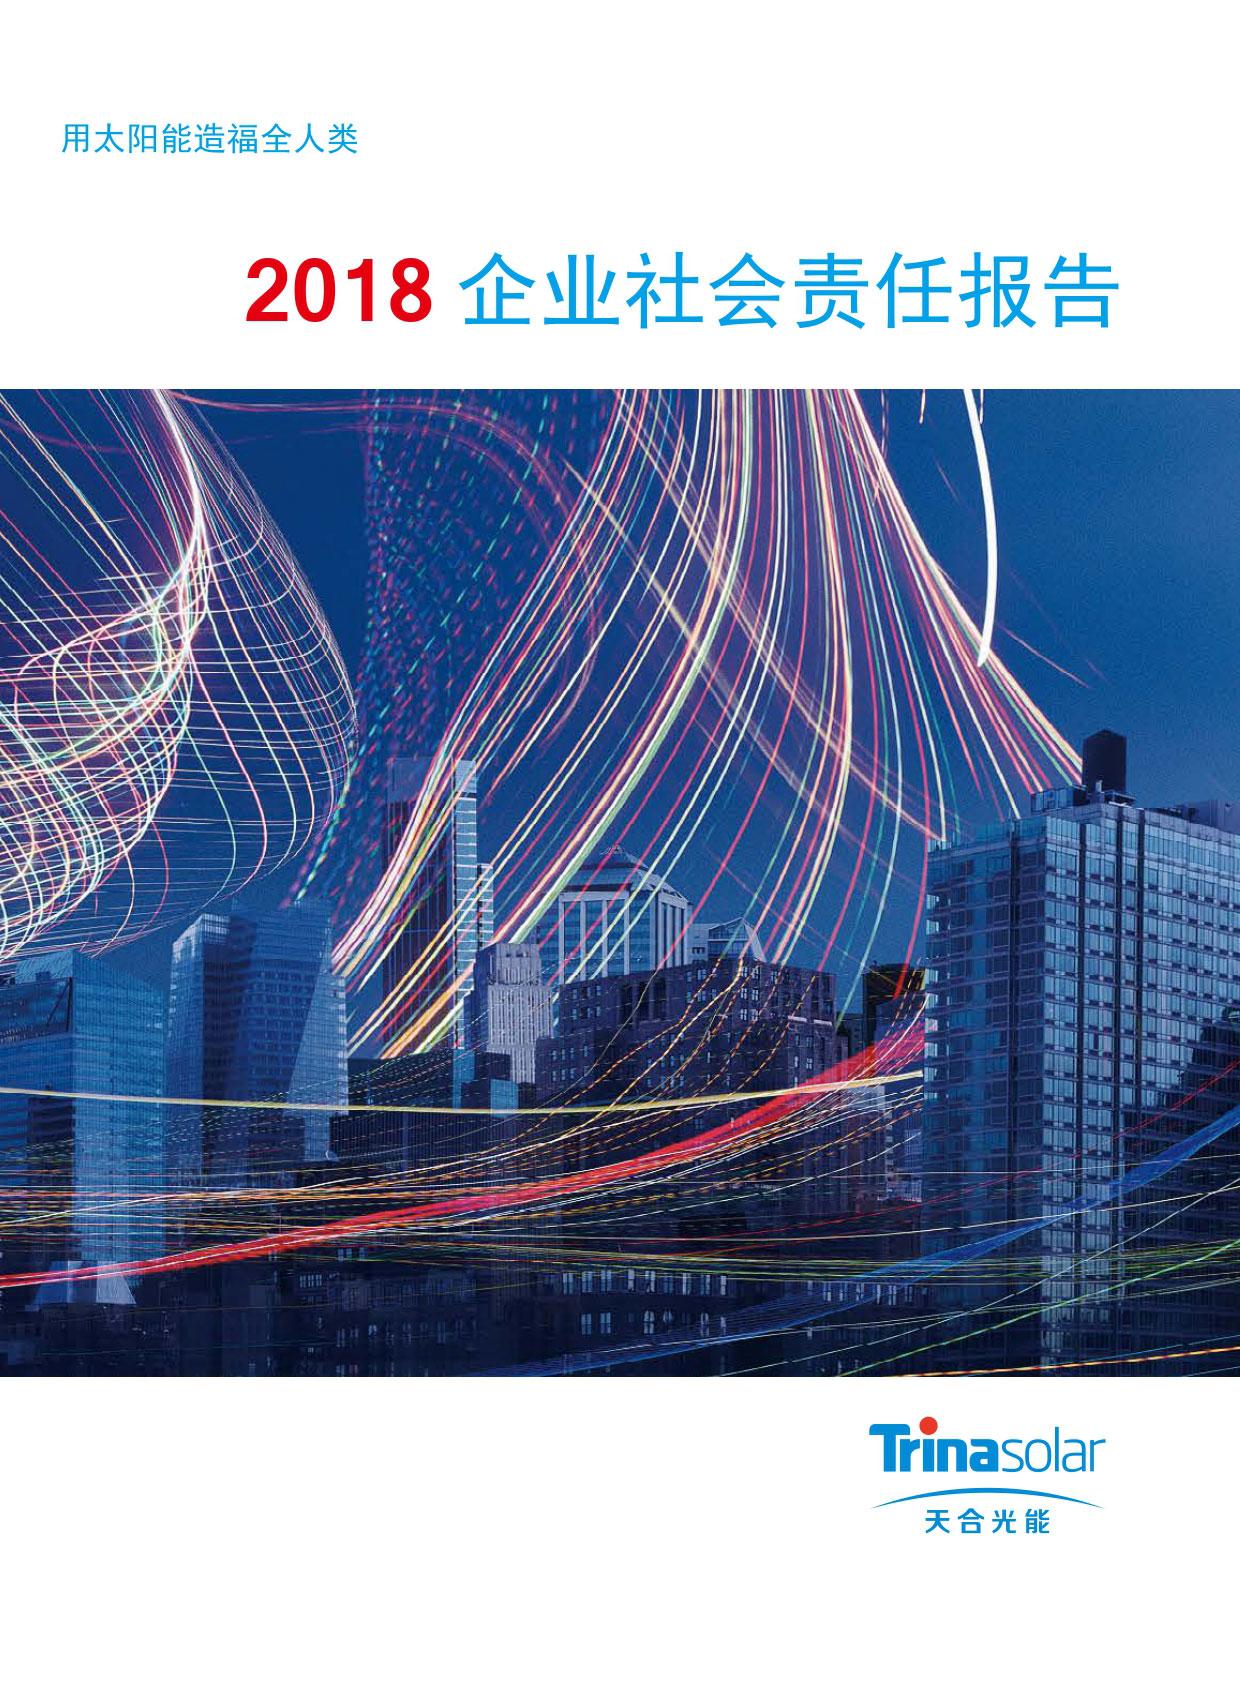 2018_TrinaSolar_CSR_Report_CN_page-0001_02